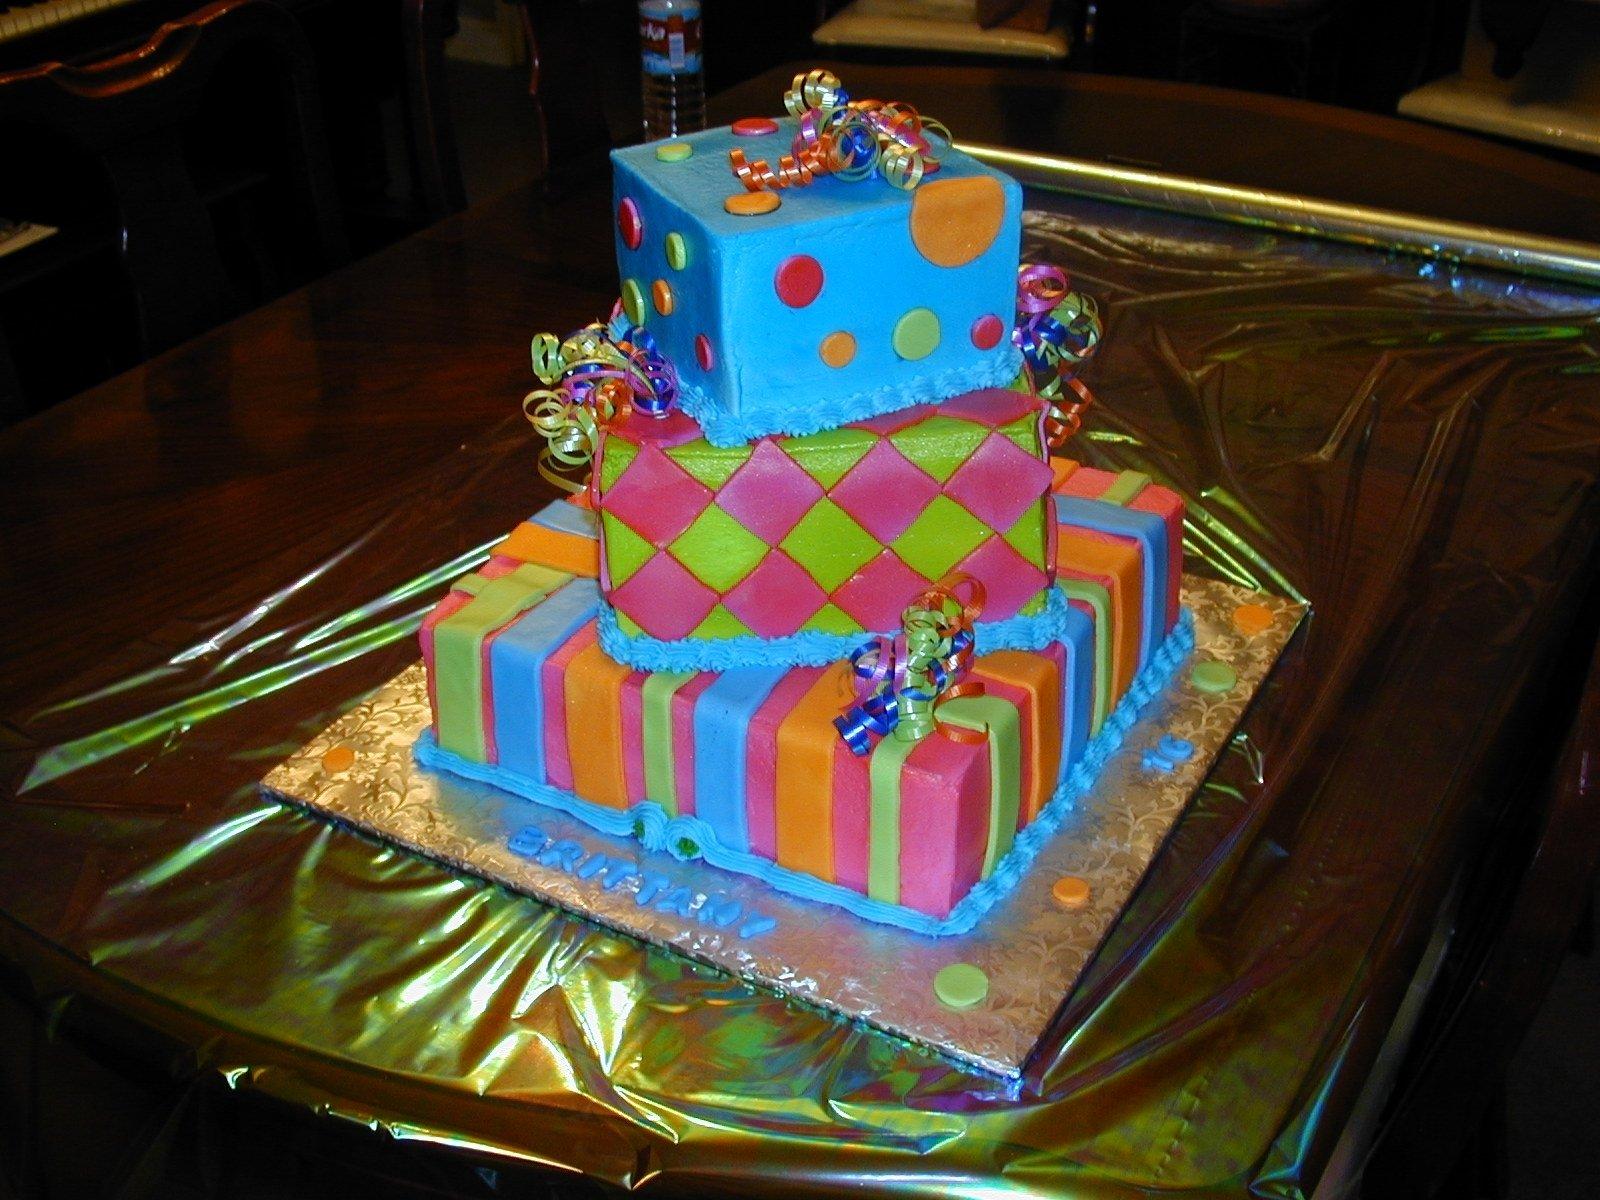 10 Amazing 16 Year Old Boy Birthday Ideas Cake Designs For A 13 Girl